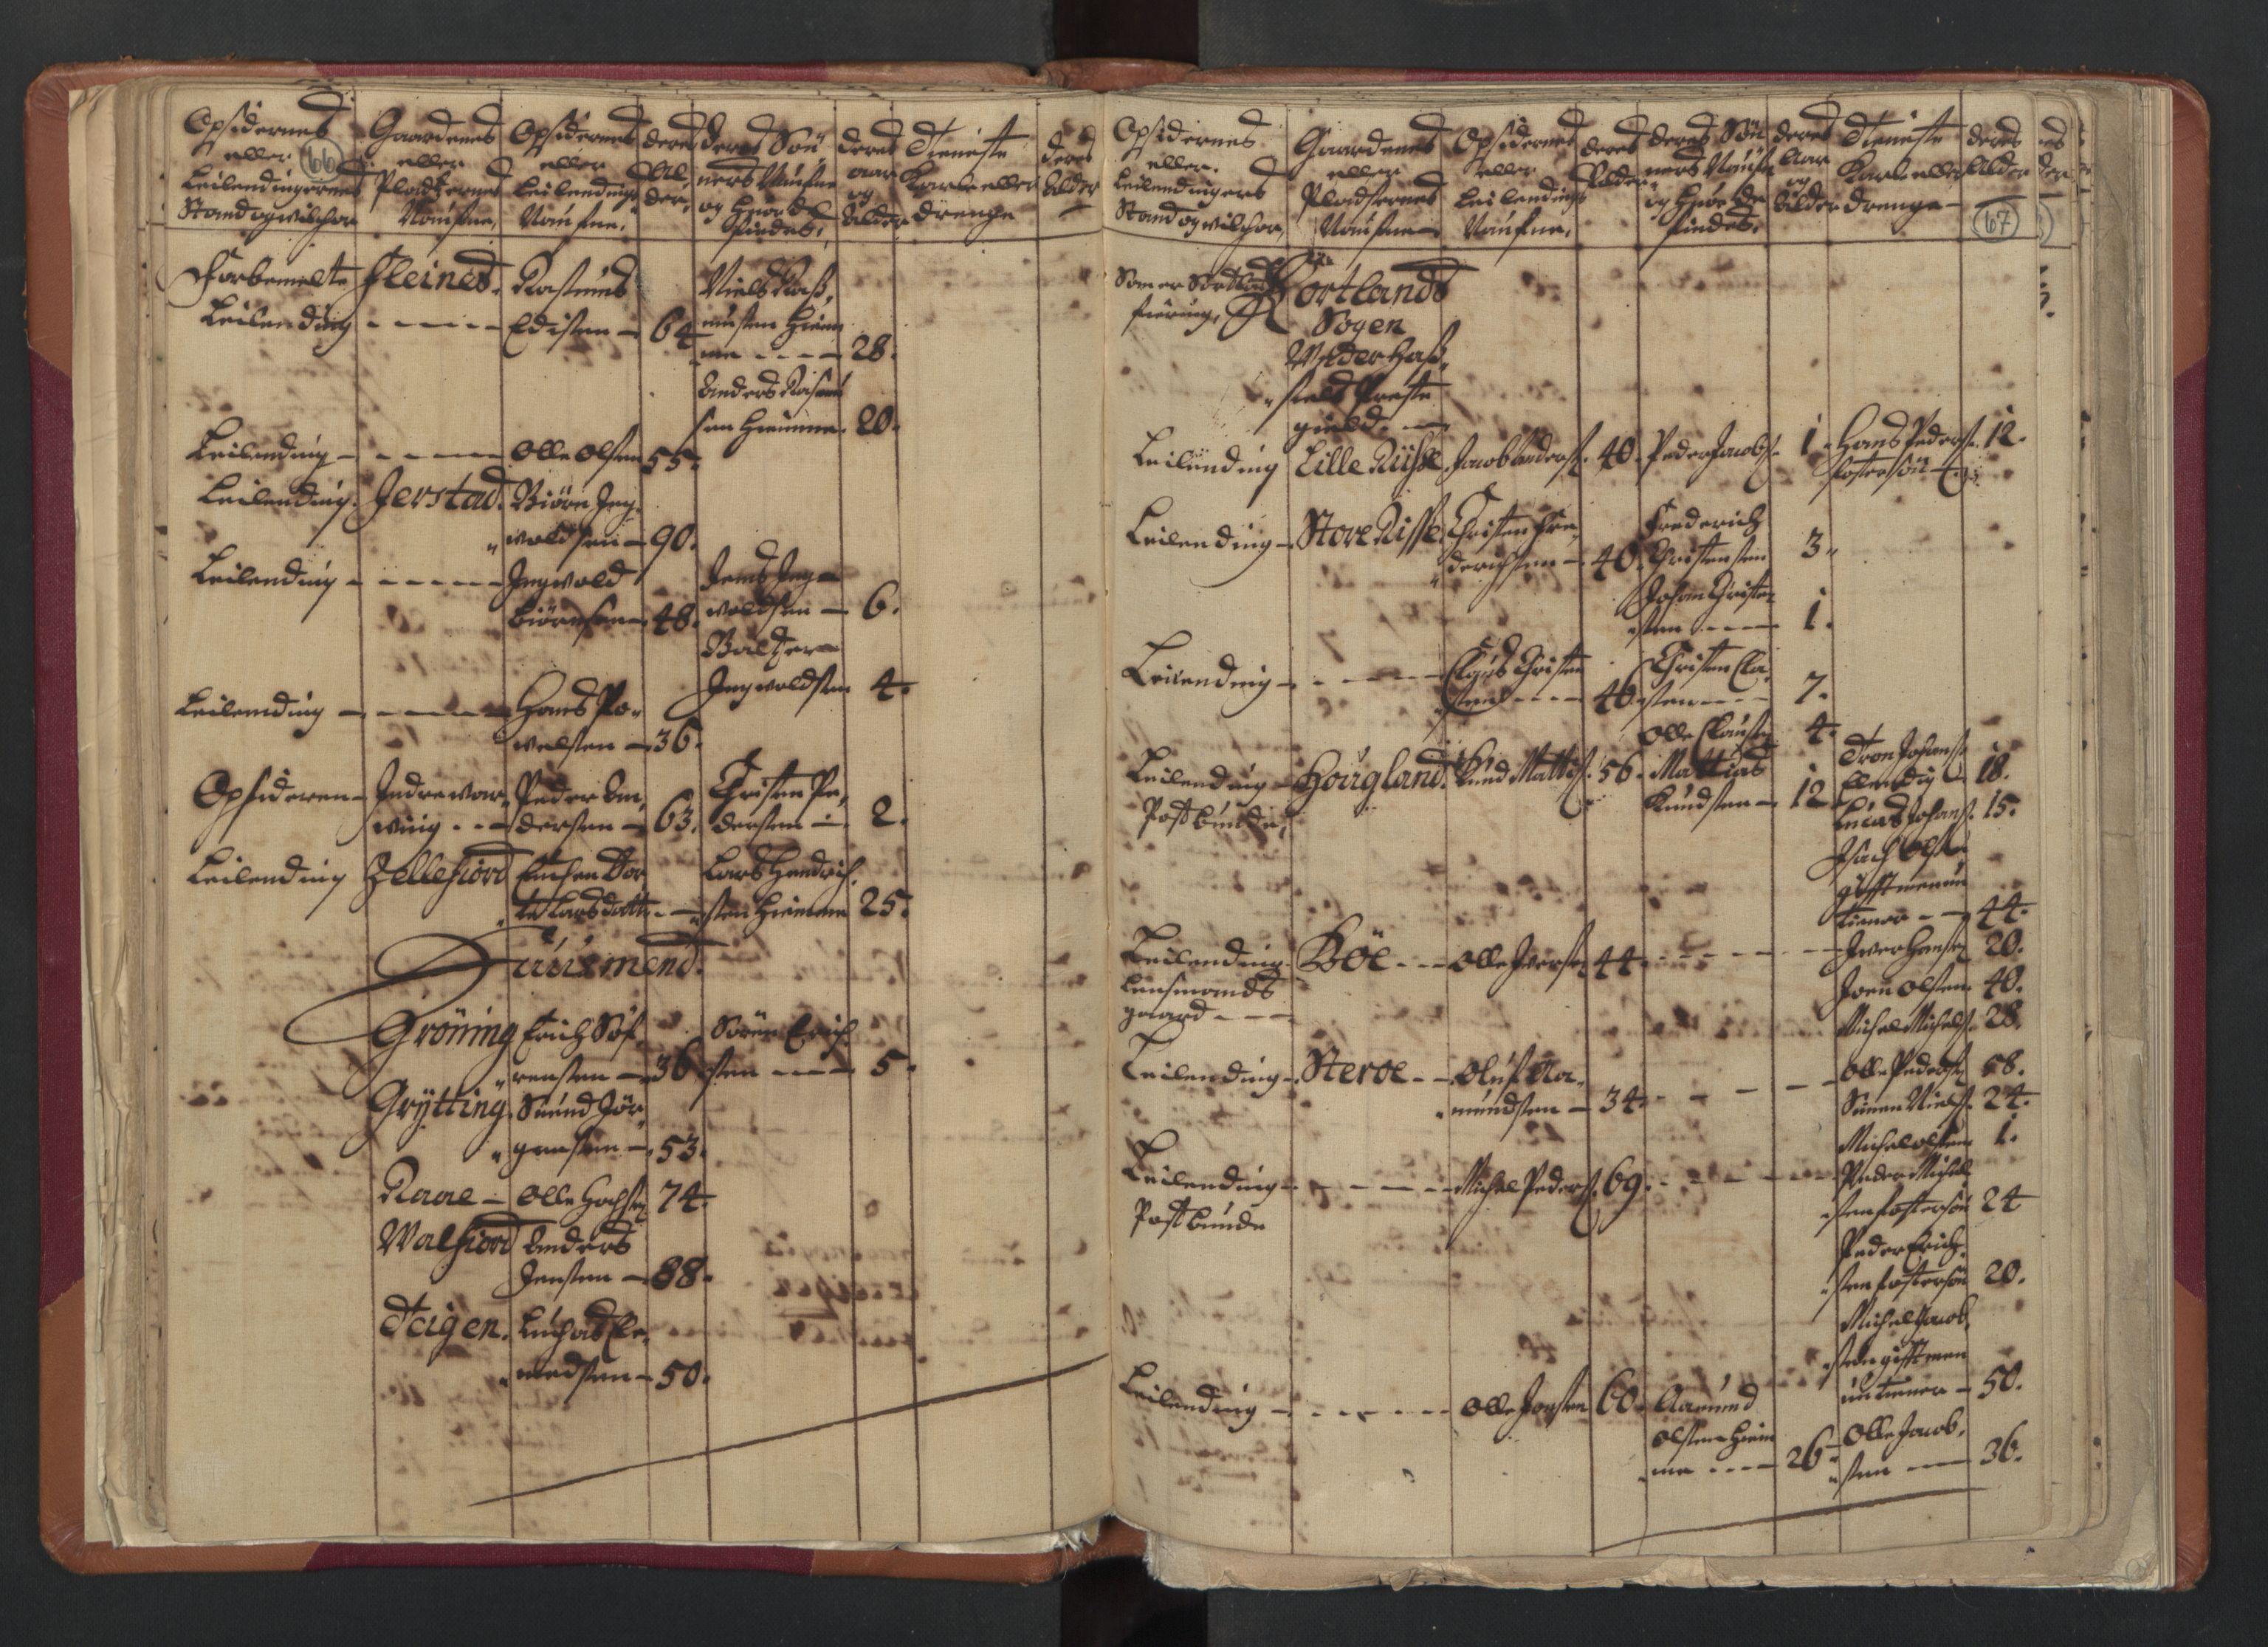 RA, Manntallet 1701, nr. 18: Vesterålen, Andenes og Lofoten fogderi, 1701, s. 66-67